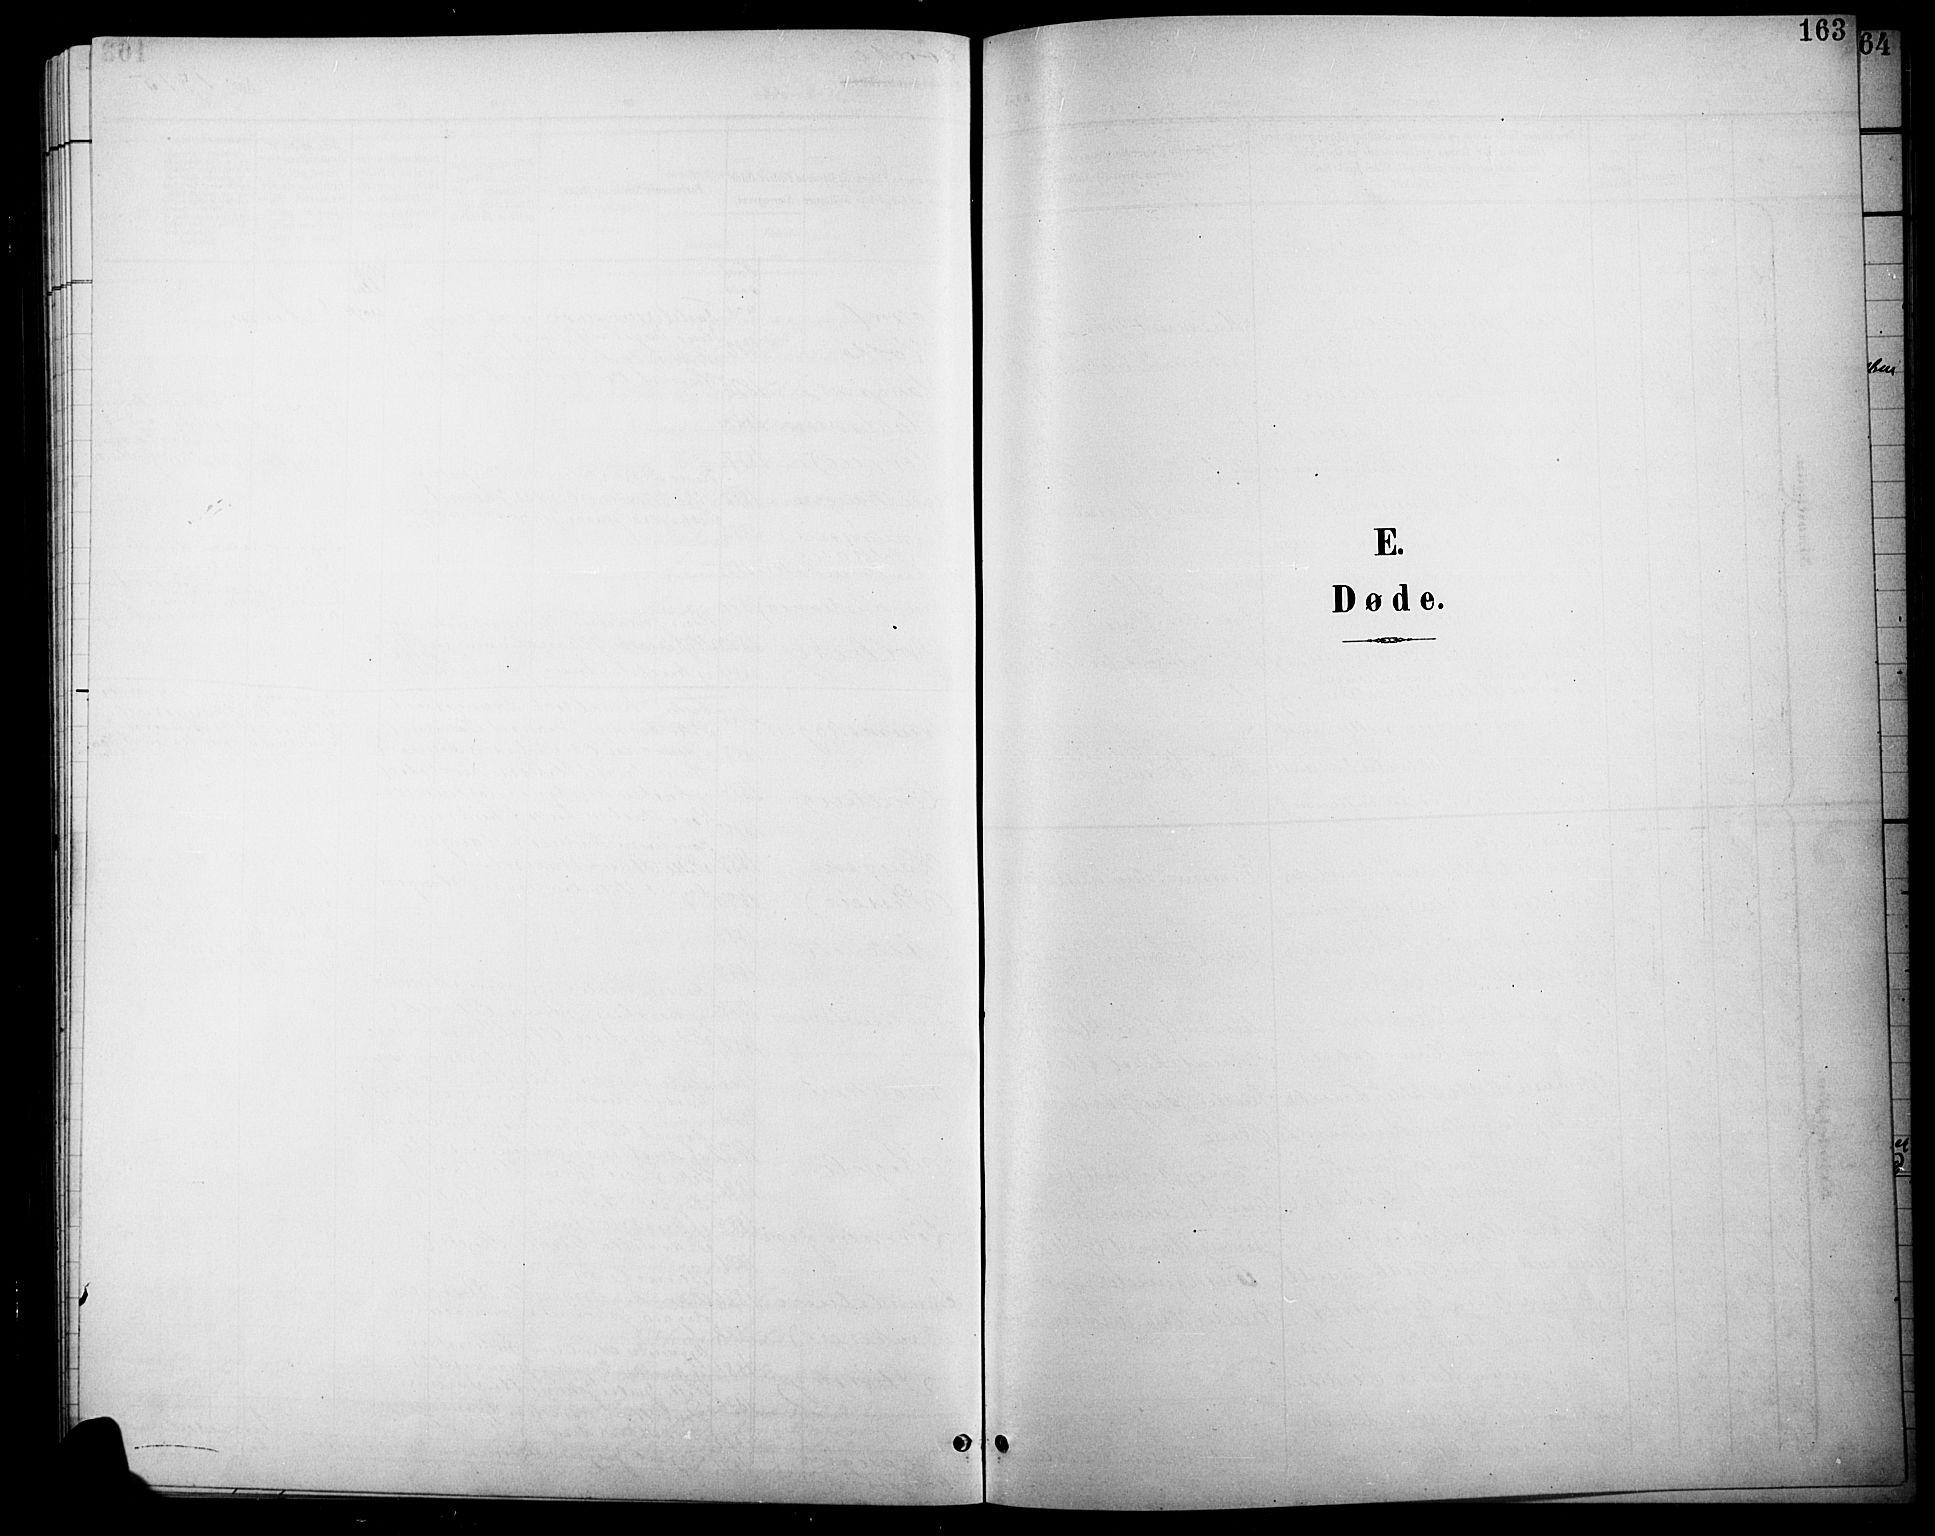 SAH, Søndre Land prestekontor, L/L0004: Klokkerbok nr. 4, 1901-1915, s. 163